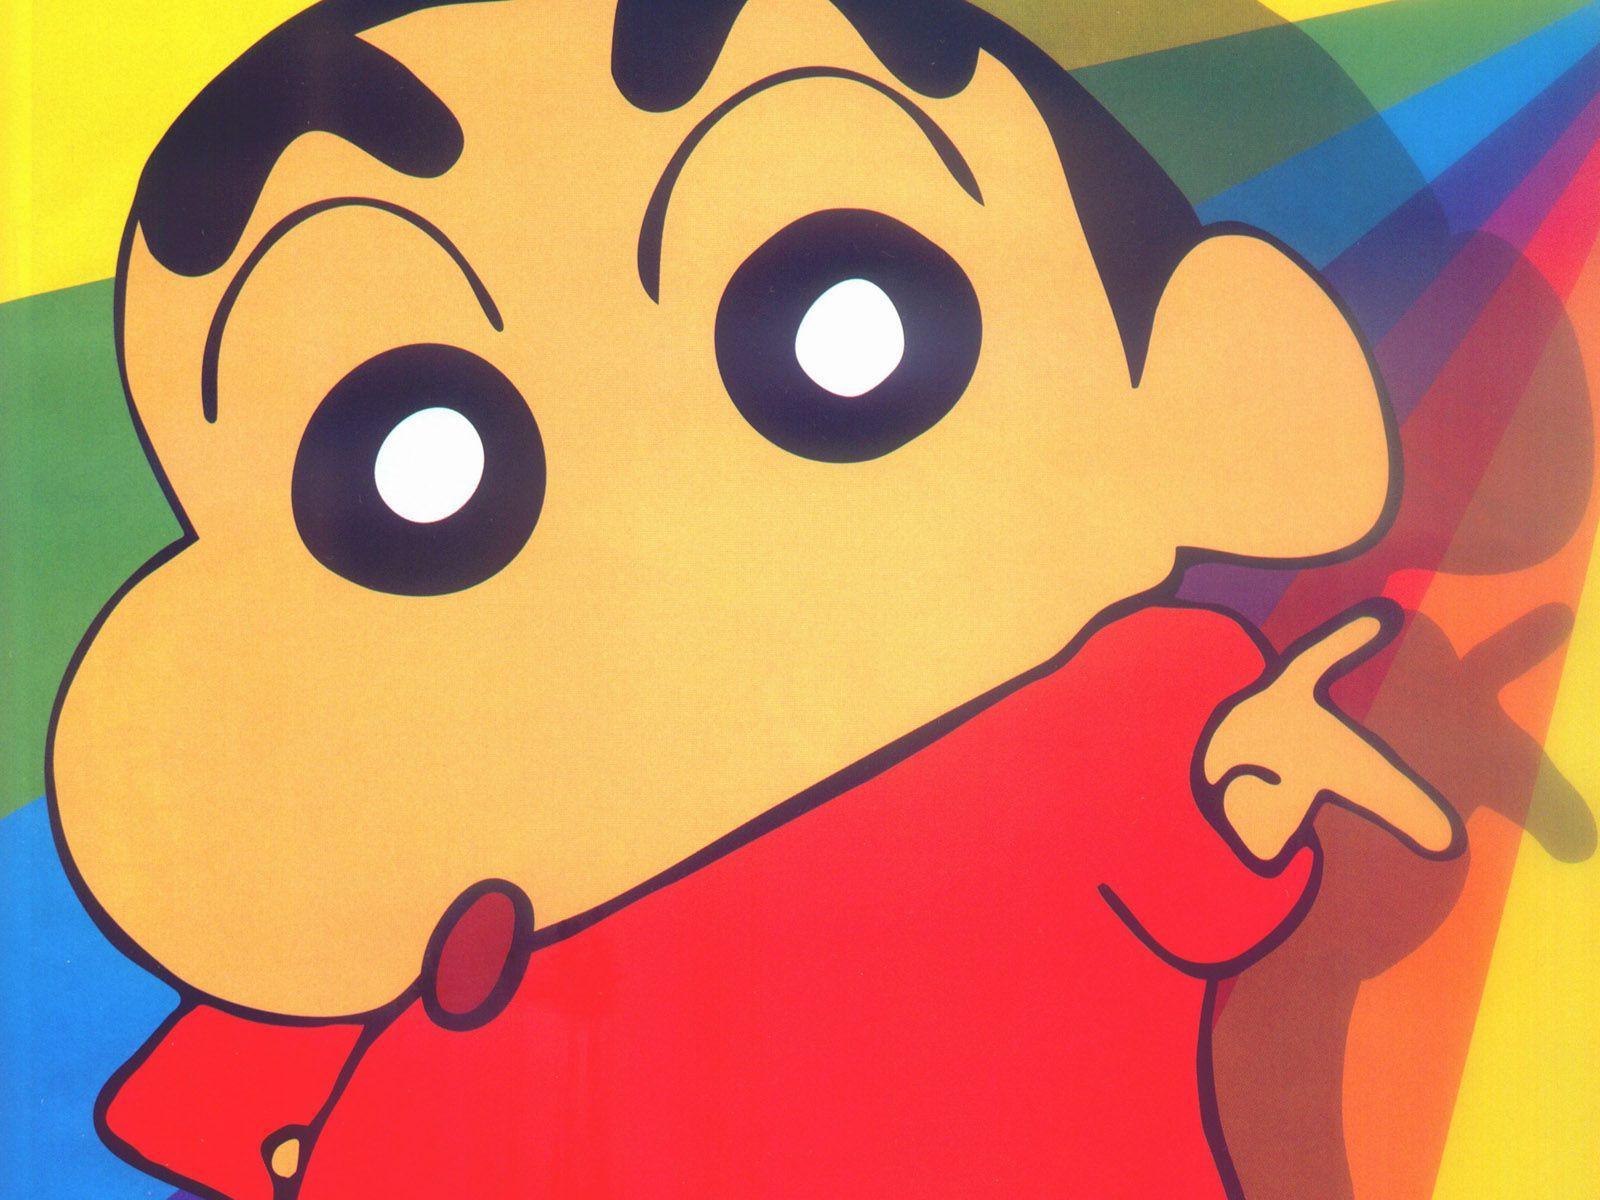 Shin-chan HD Wallpapers - Wallpaper Cave